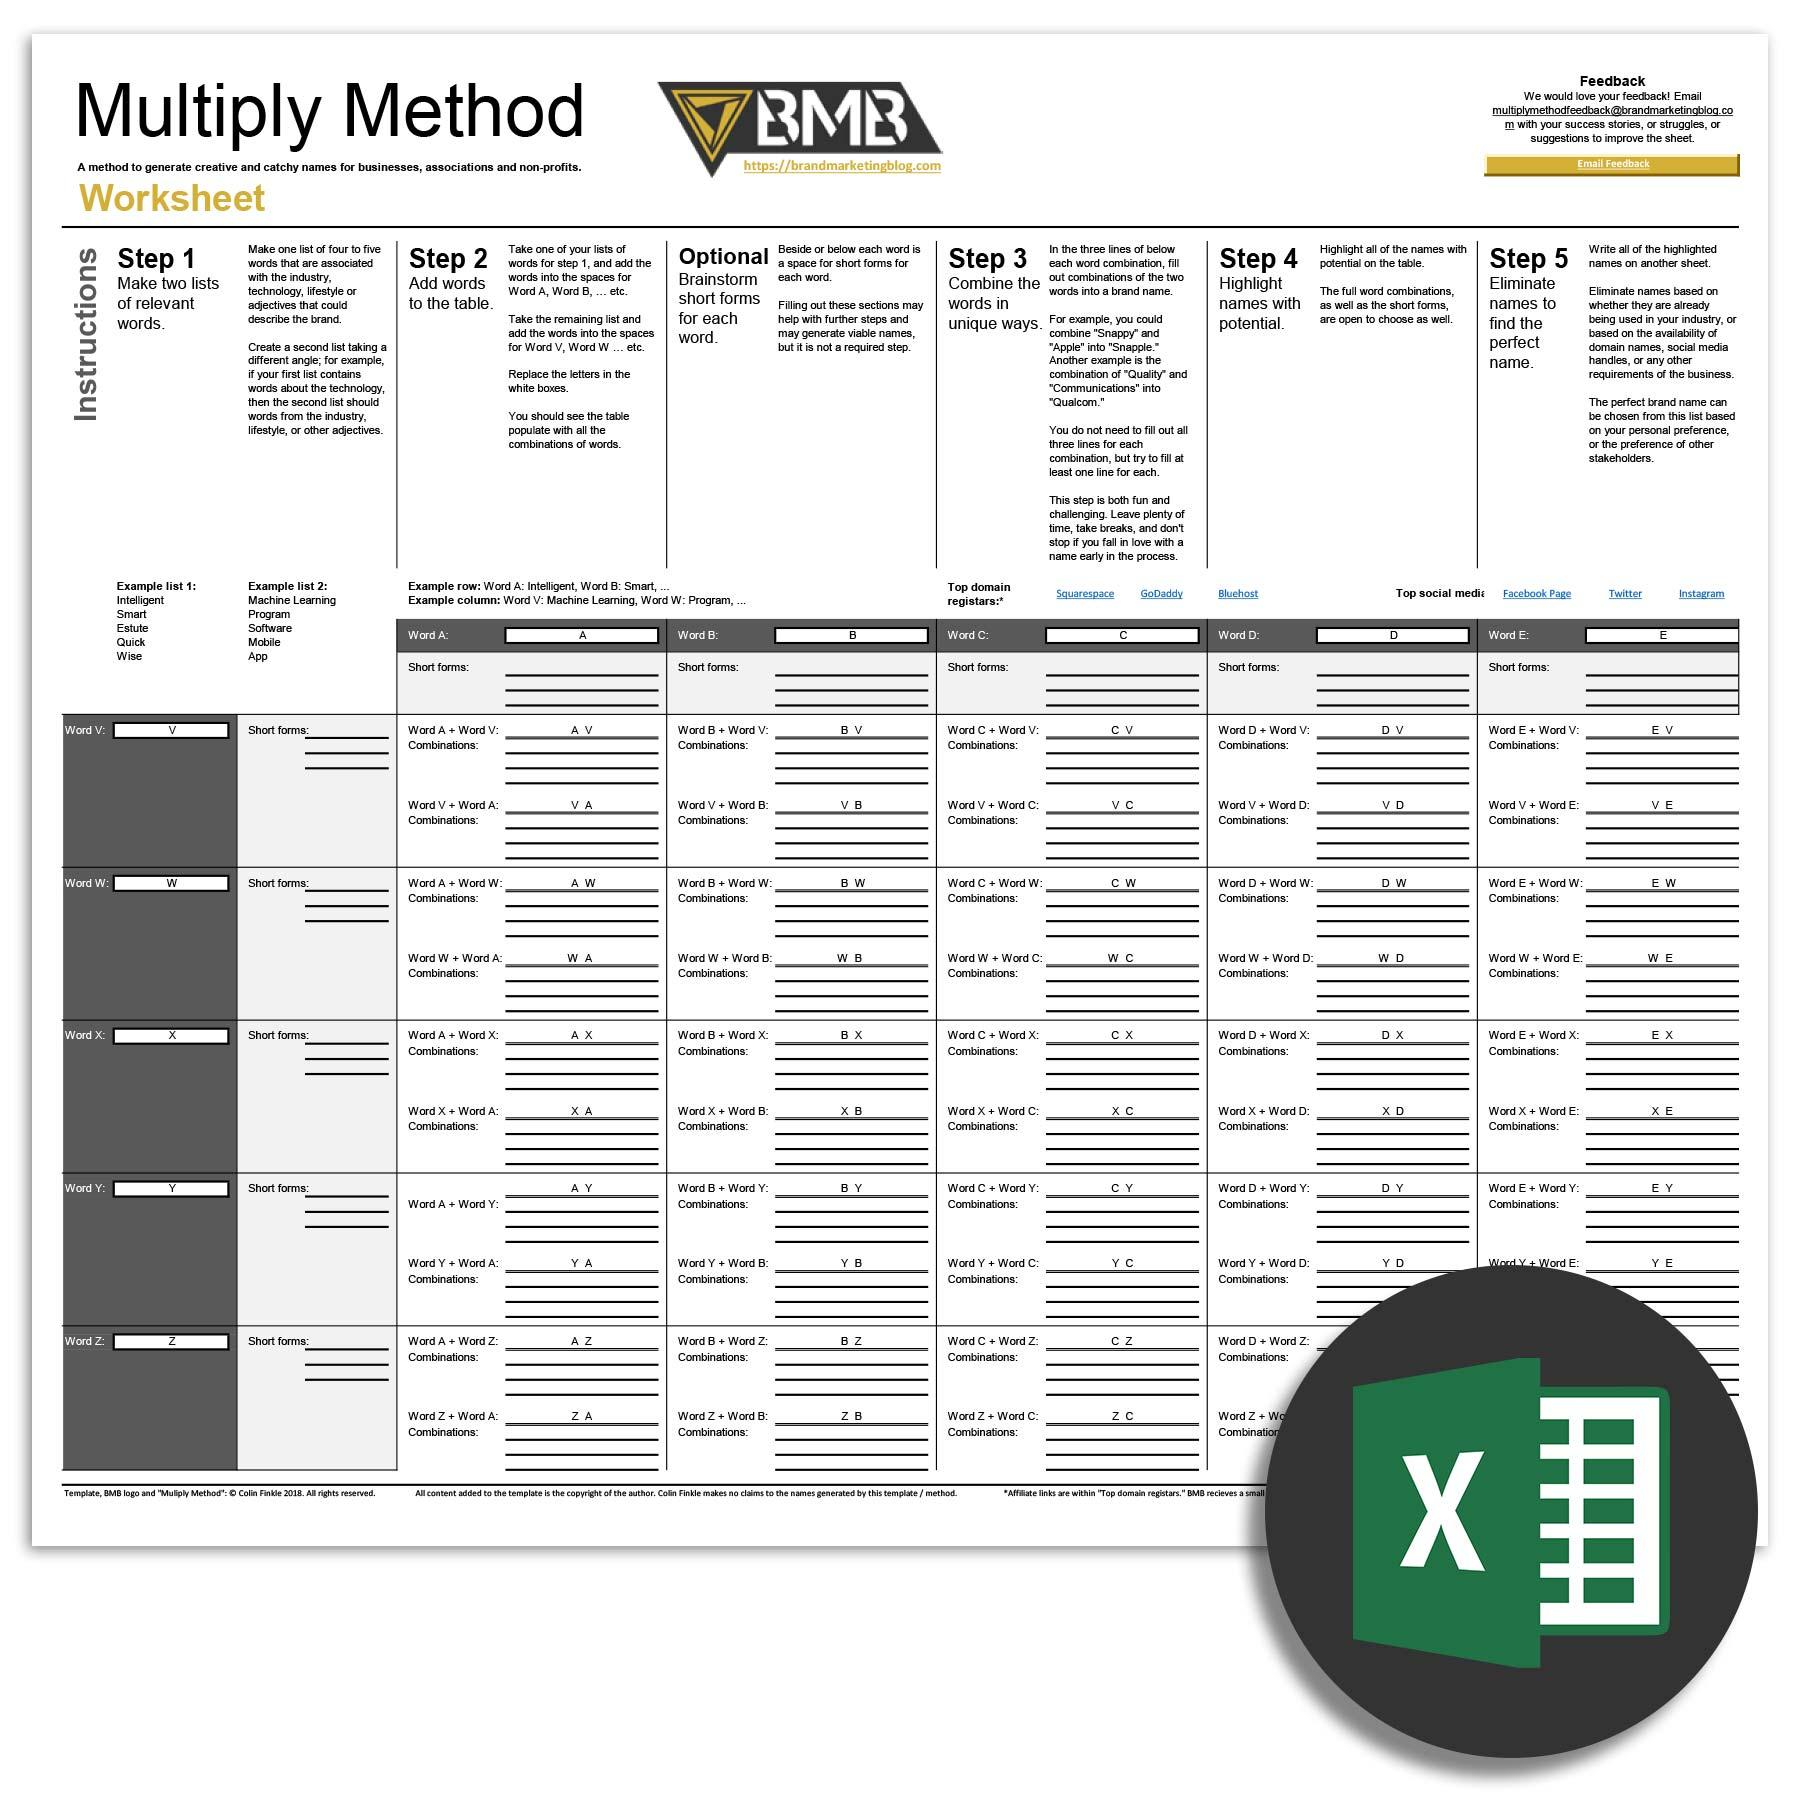 Affiliate Marketing Spreadsheet Within Multiply Method